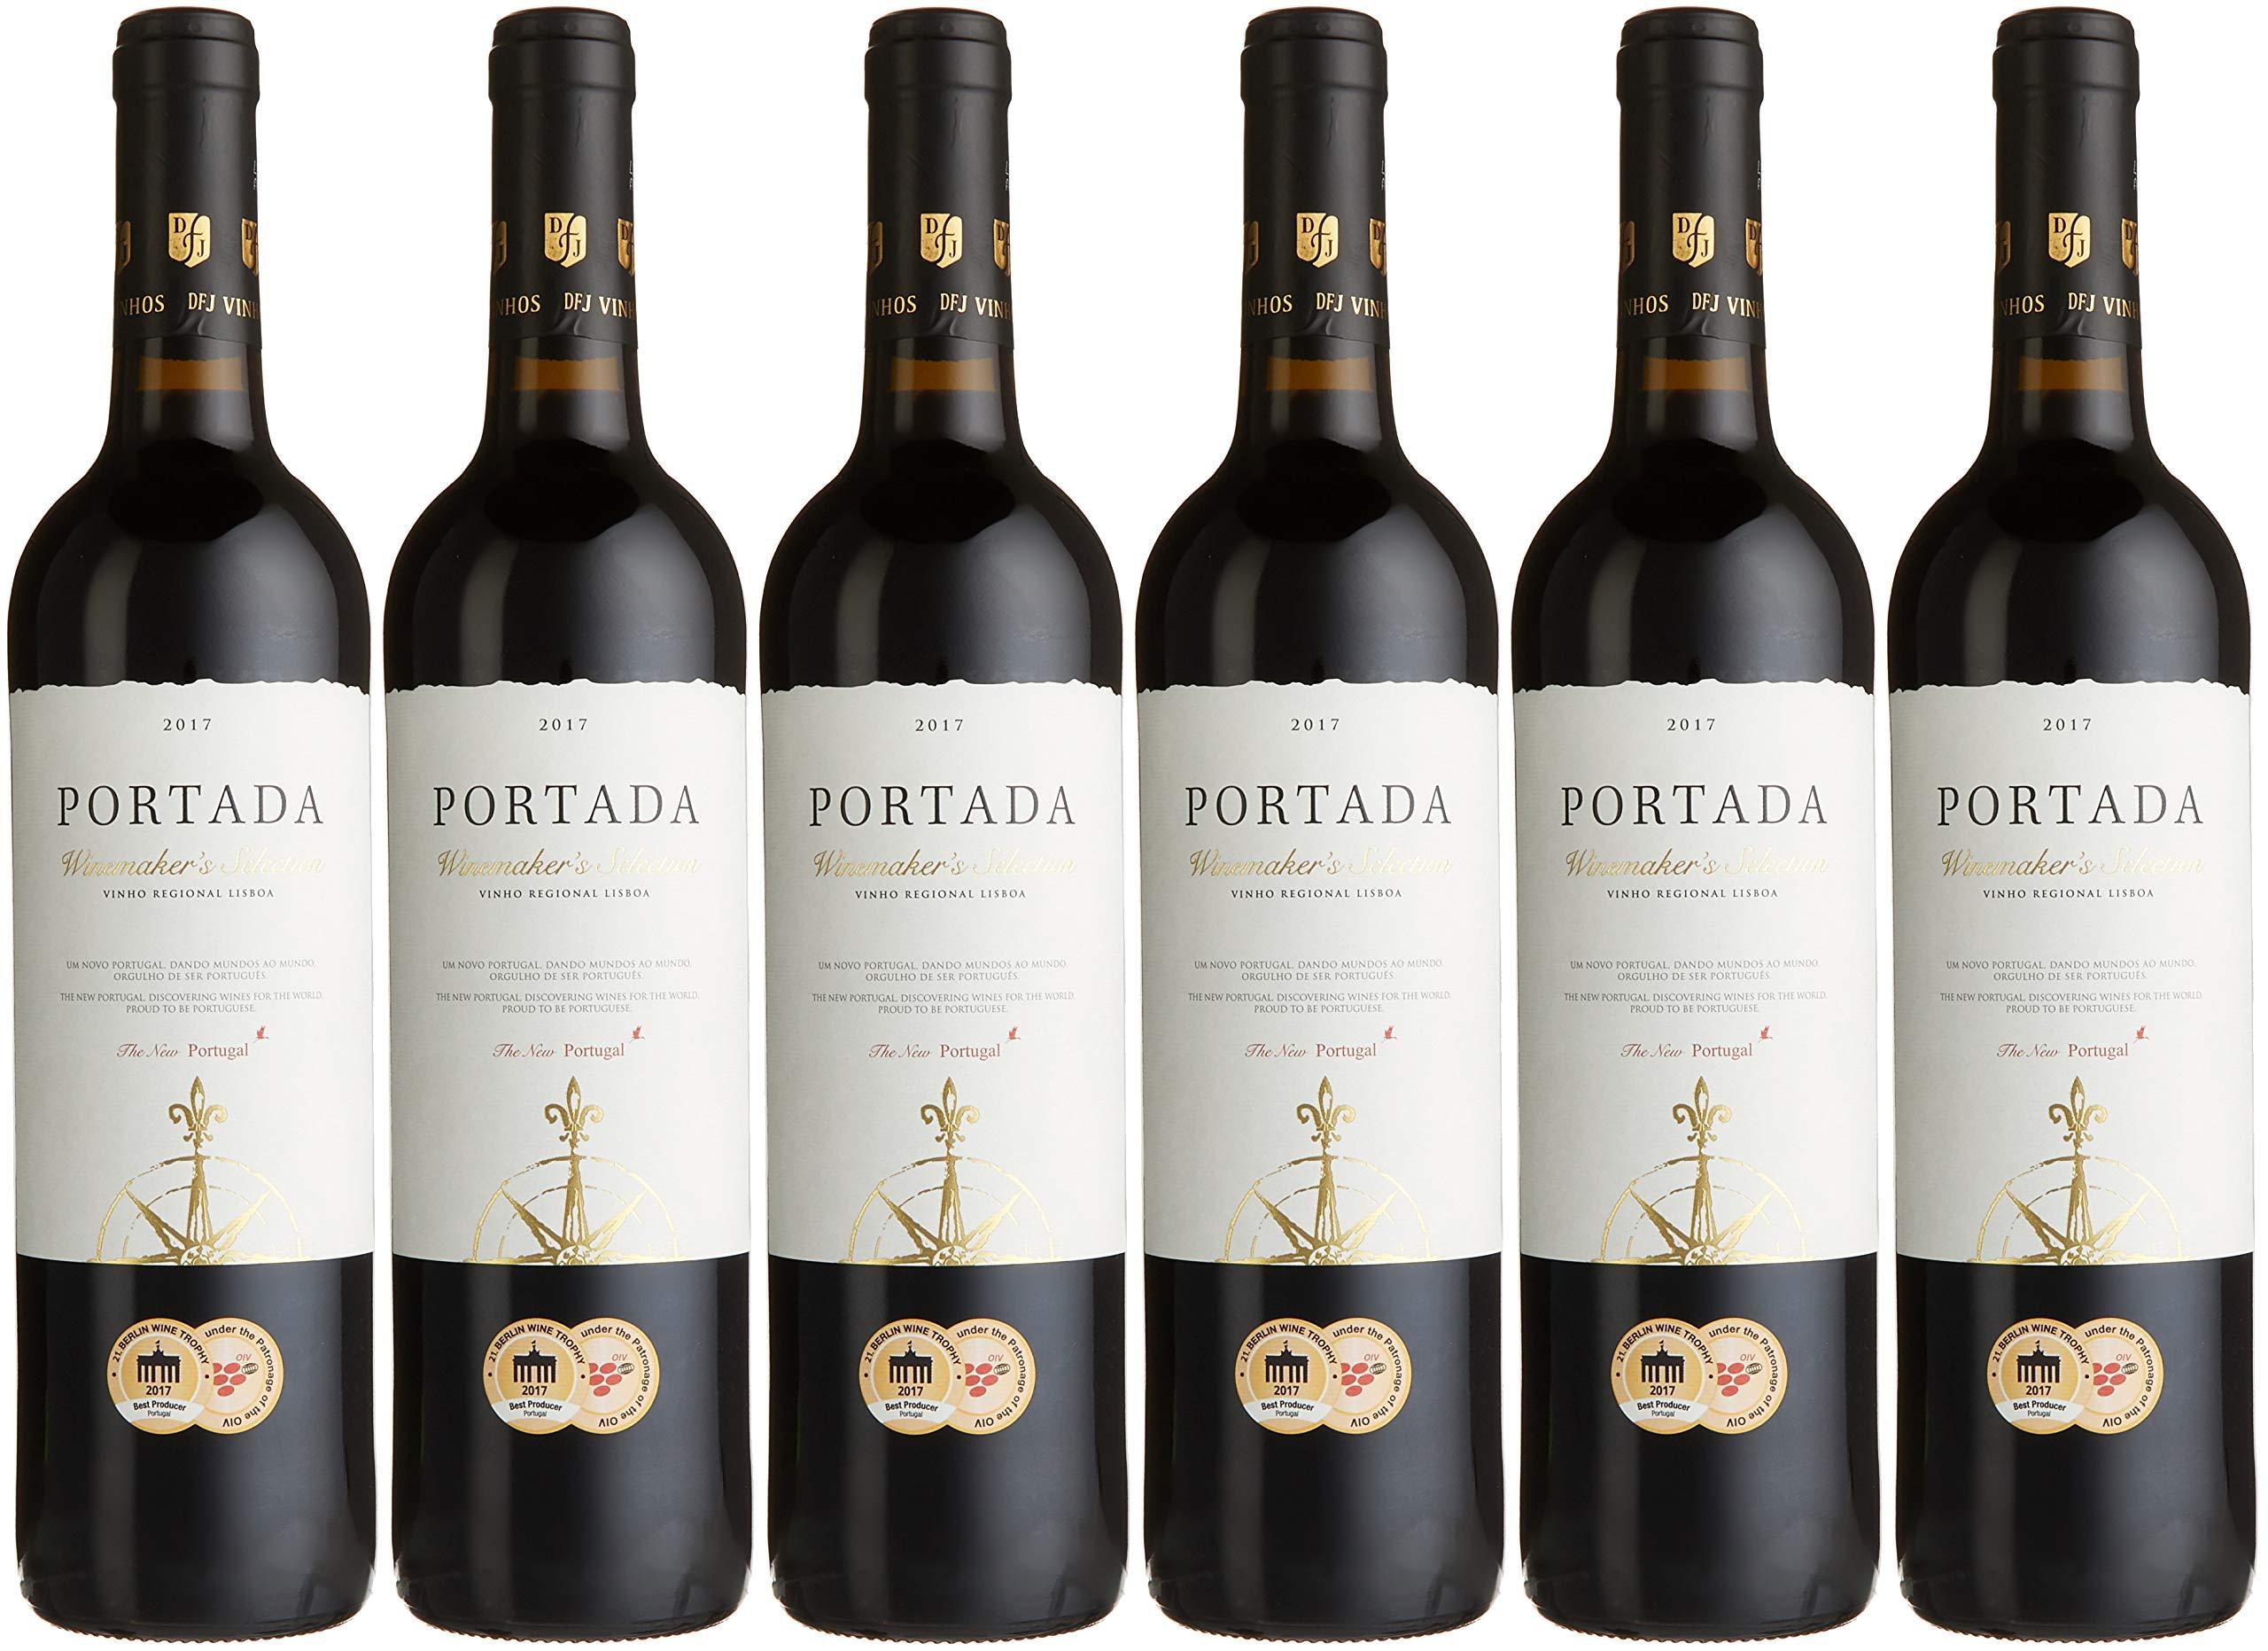 DFJ-Vinhos-Portada-Tinto-2017-halbtrocken-075-L-Flaschen